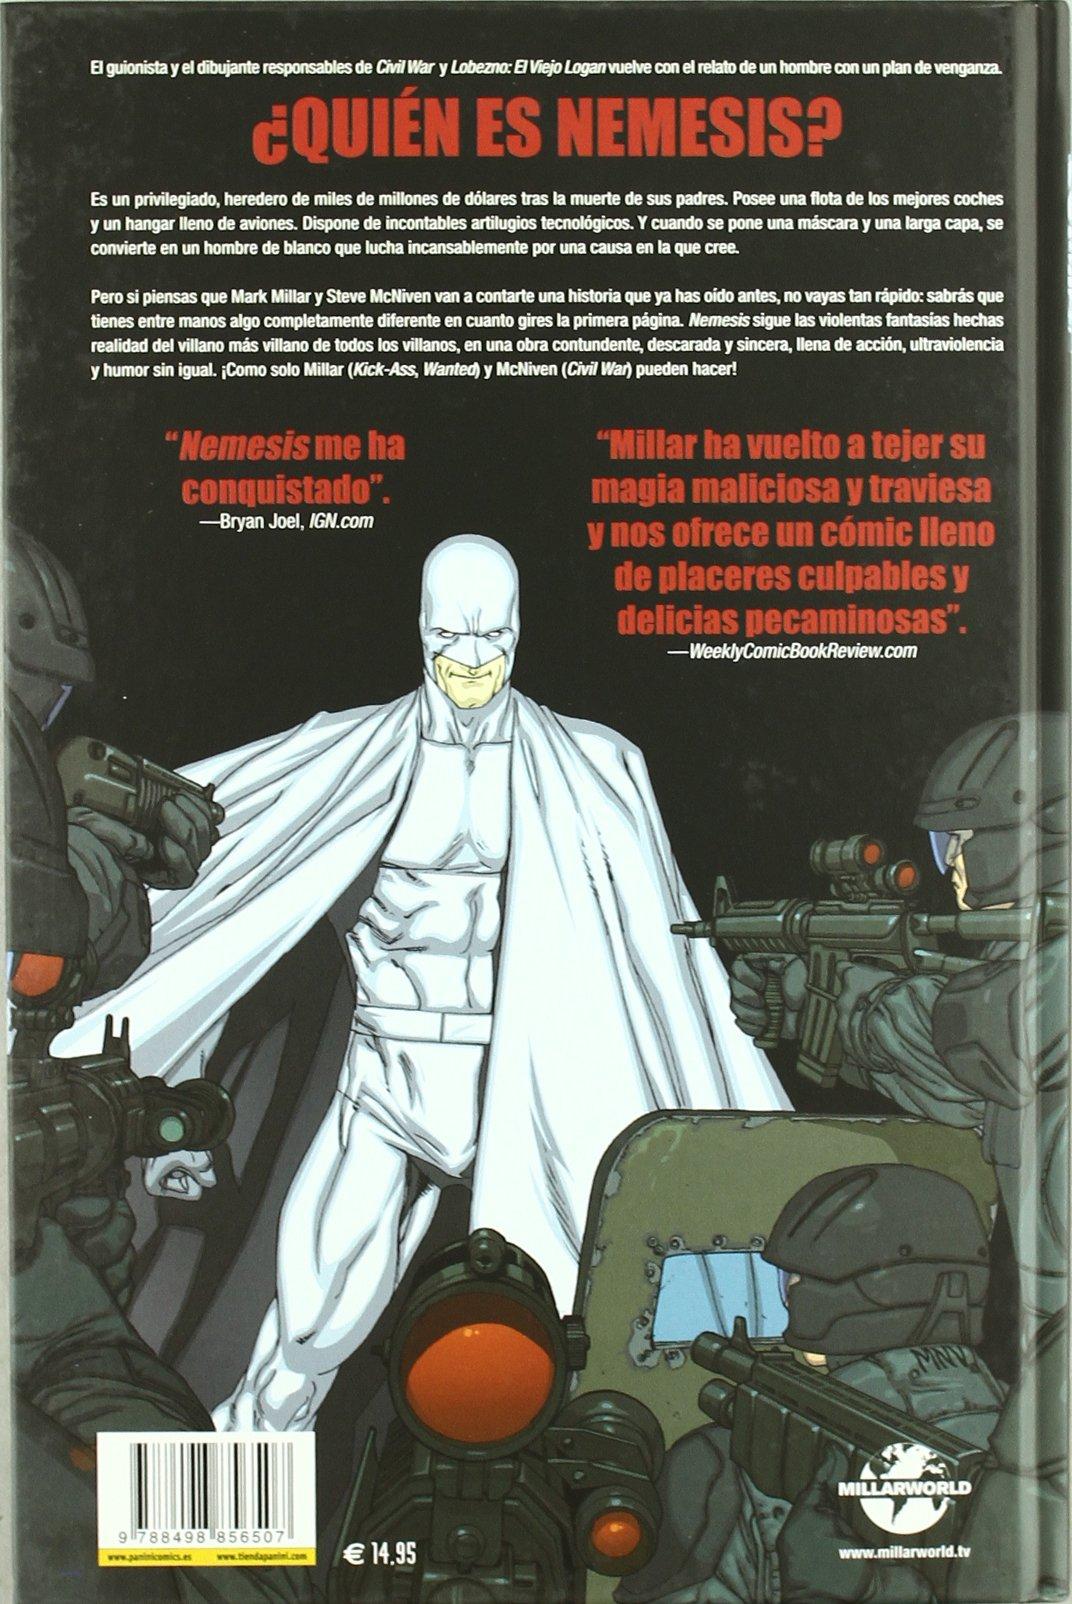 Nemesis: Mark (1969-) , McNiven, Steve Millar: 9788498856507: Amazon.com: Books